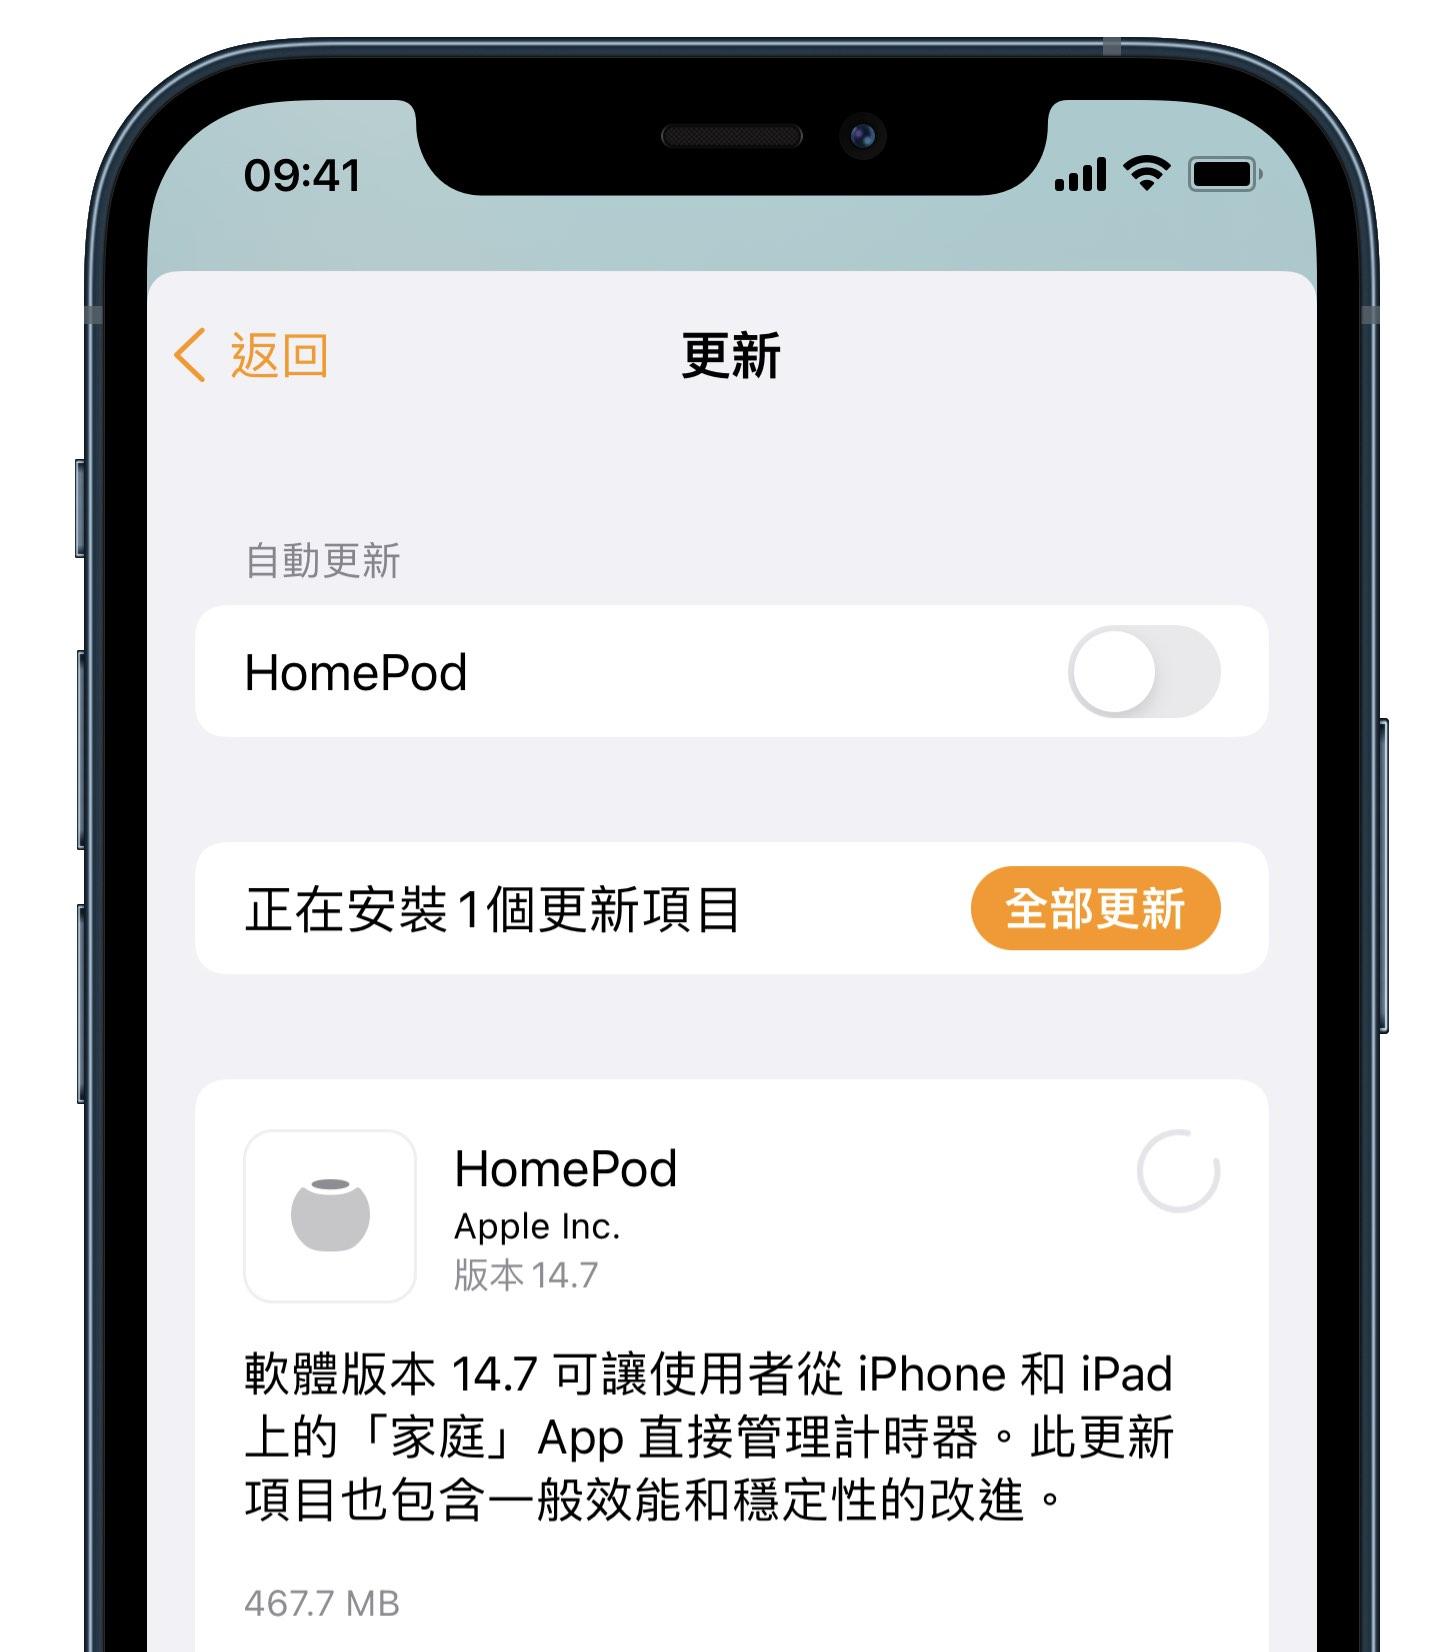 HomePod 14.7